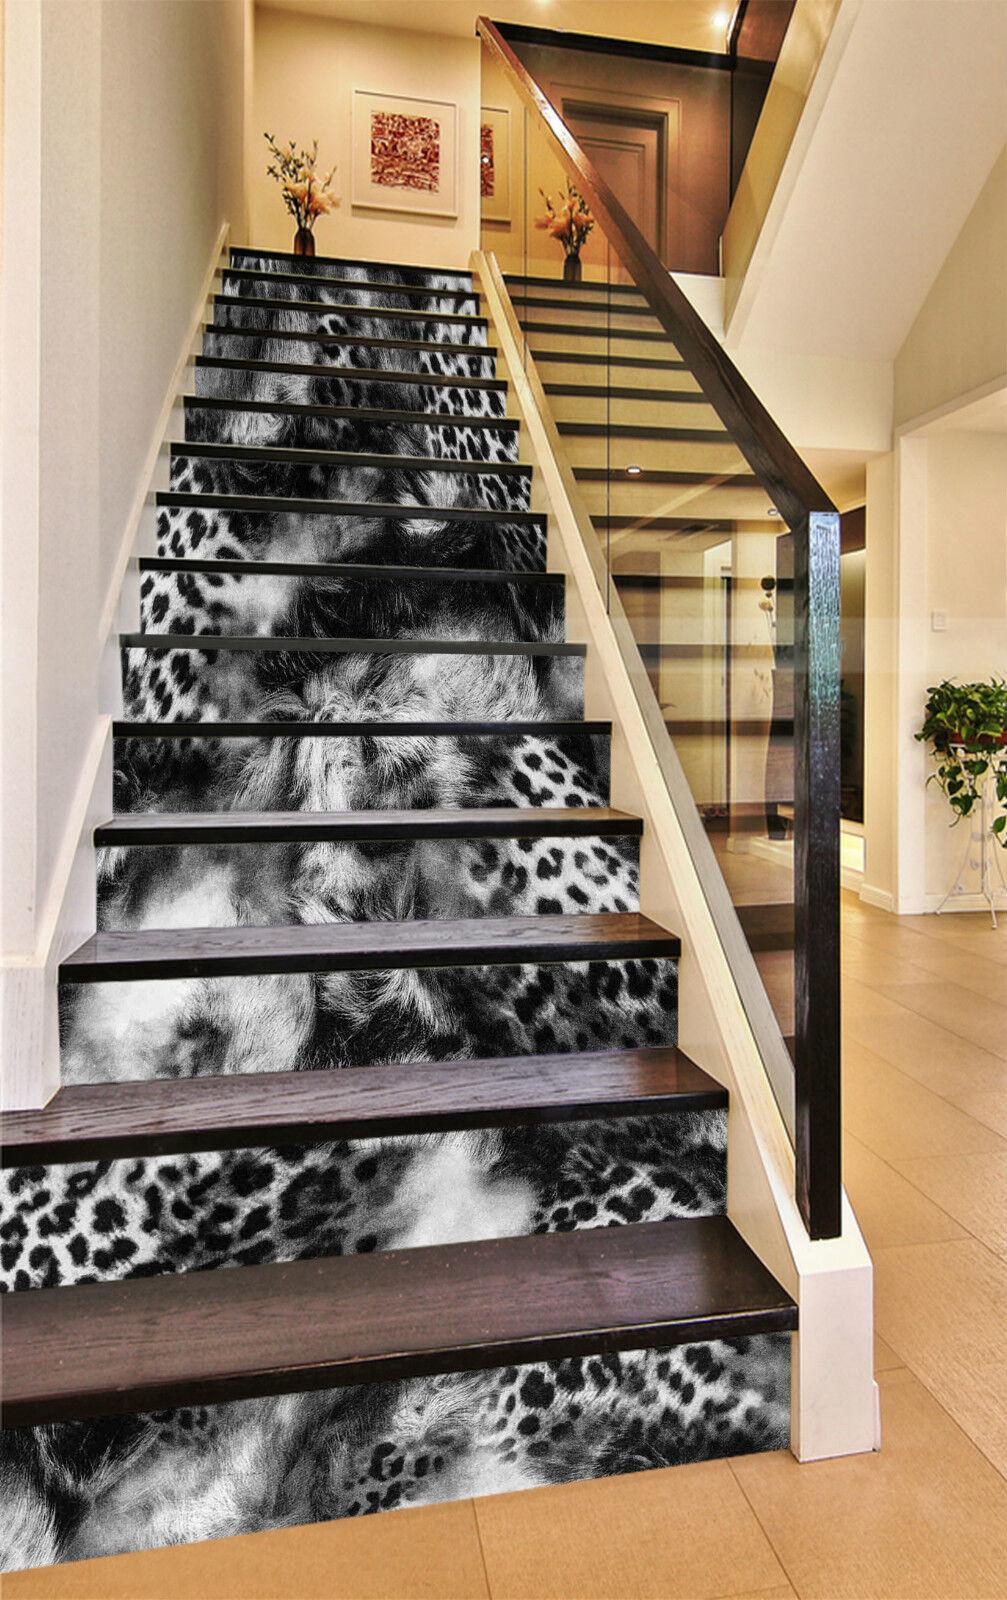 3D Tierischen Fell Stair Risers Dekoration Fototapete Vinyl Aufkleber Tapete DE